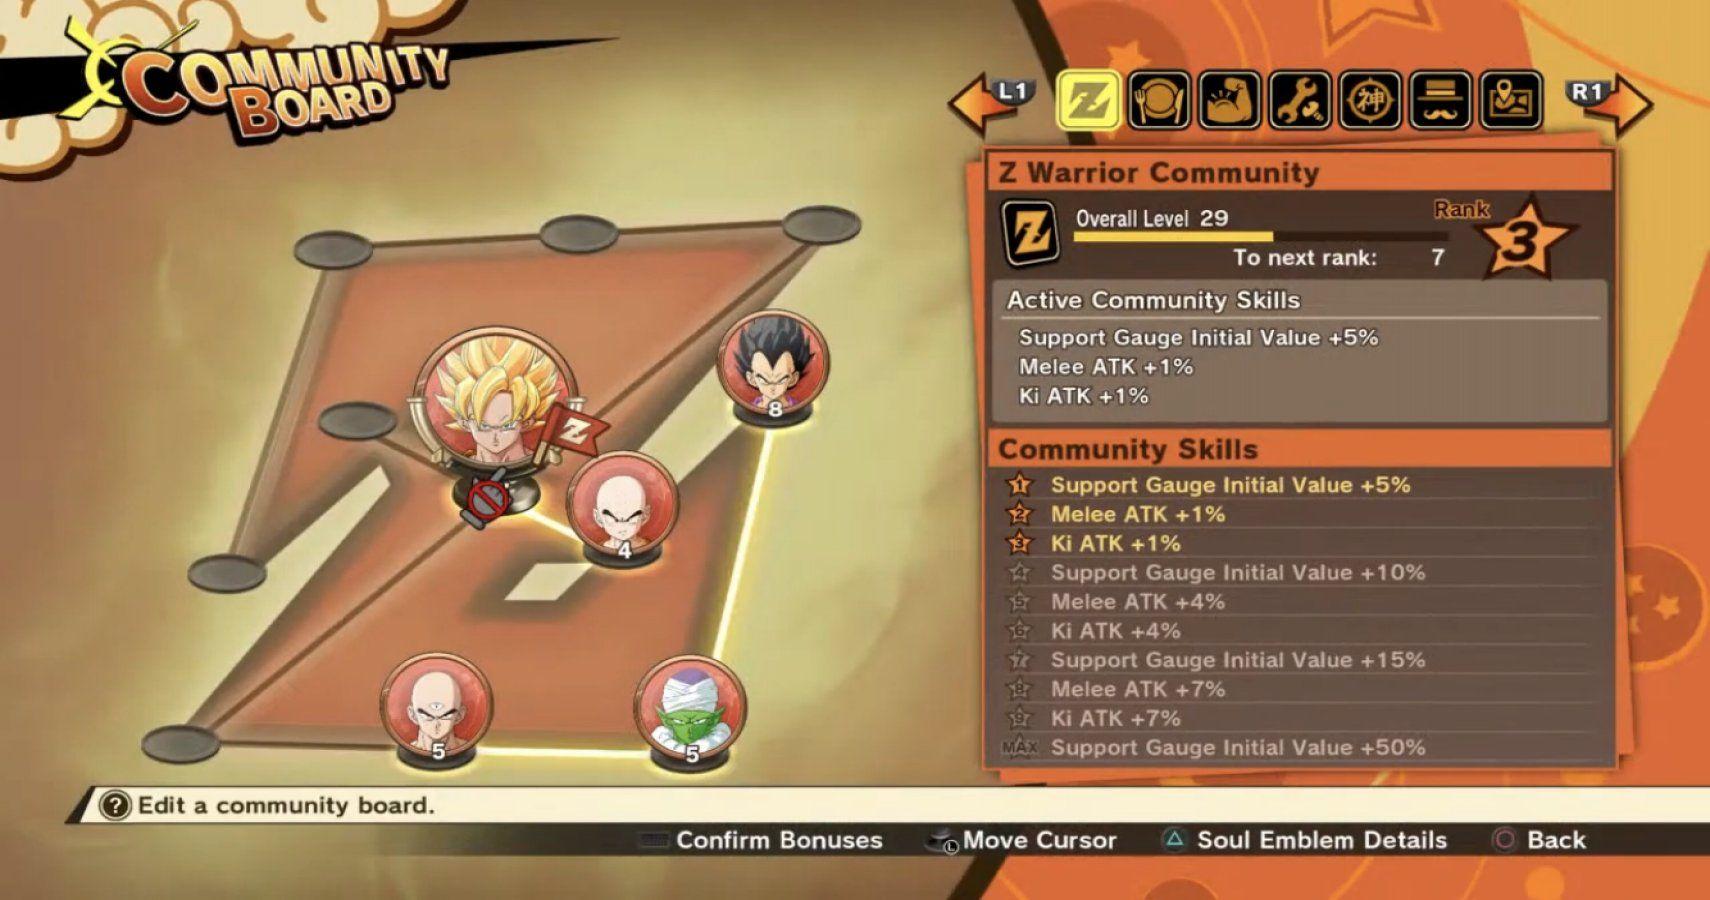 Dragon Ball Z: Kakarot - Community Board And Soul Emblems Guide